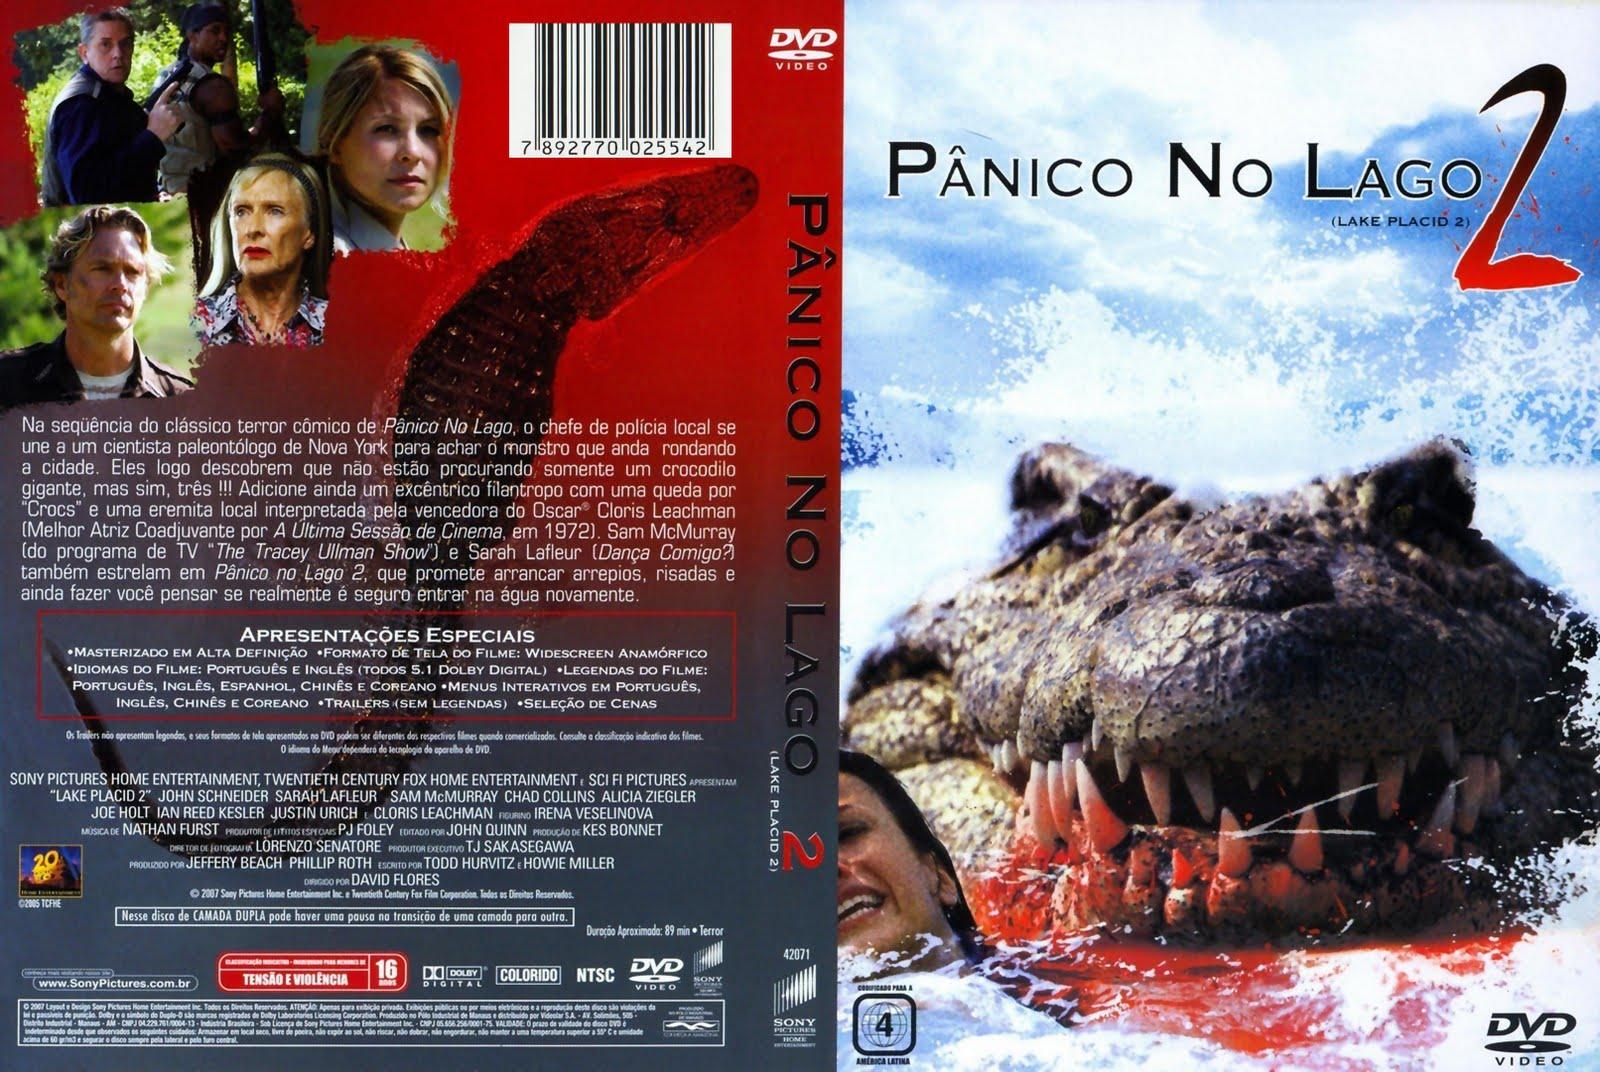 anaconda 2 full movie free online